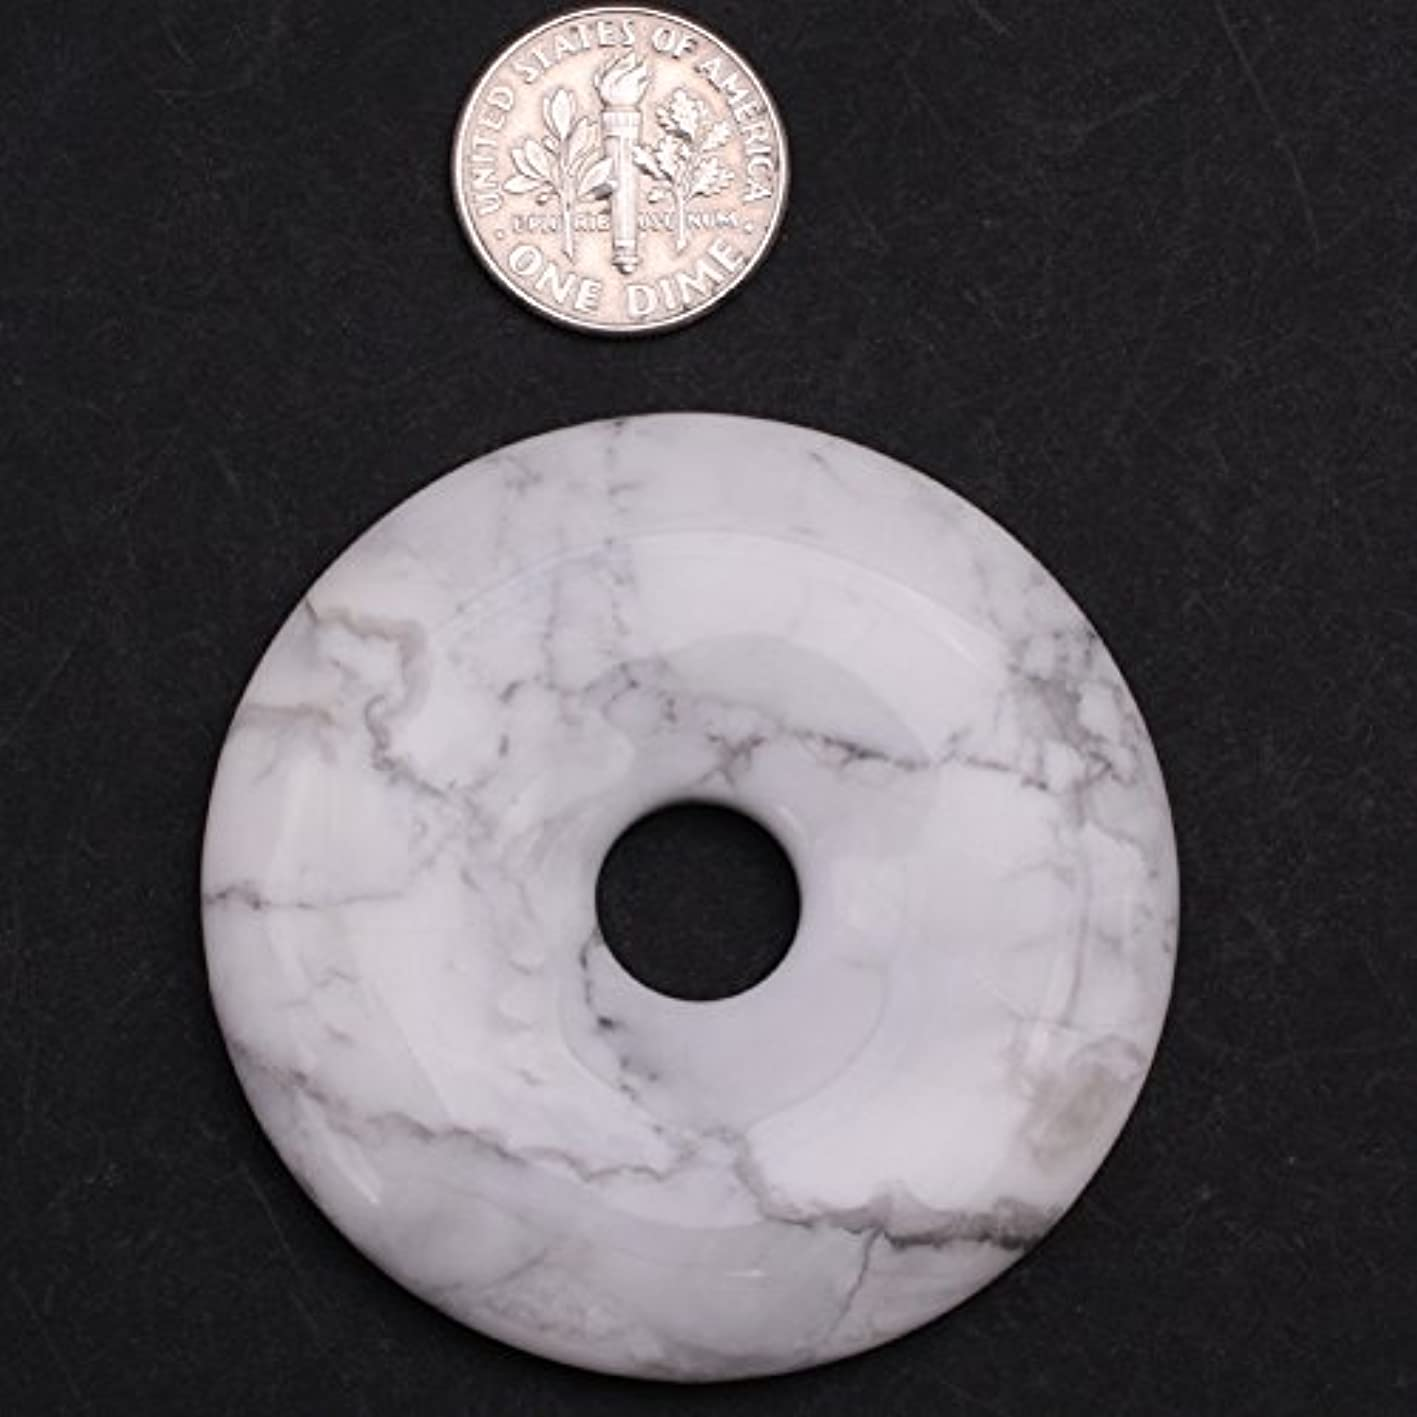 50mm Natural White Howlite Beads For Jewelry Making Gemstone Ring Circle for Earring Bracelet Necklace Jewelry Making (Inside Hole: 9mm) JOE FOREMAN rrsxnkwgjve067